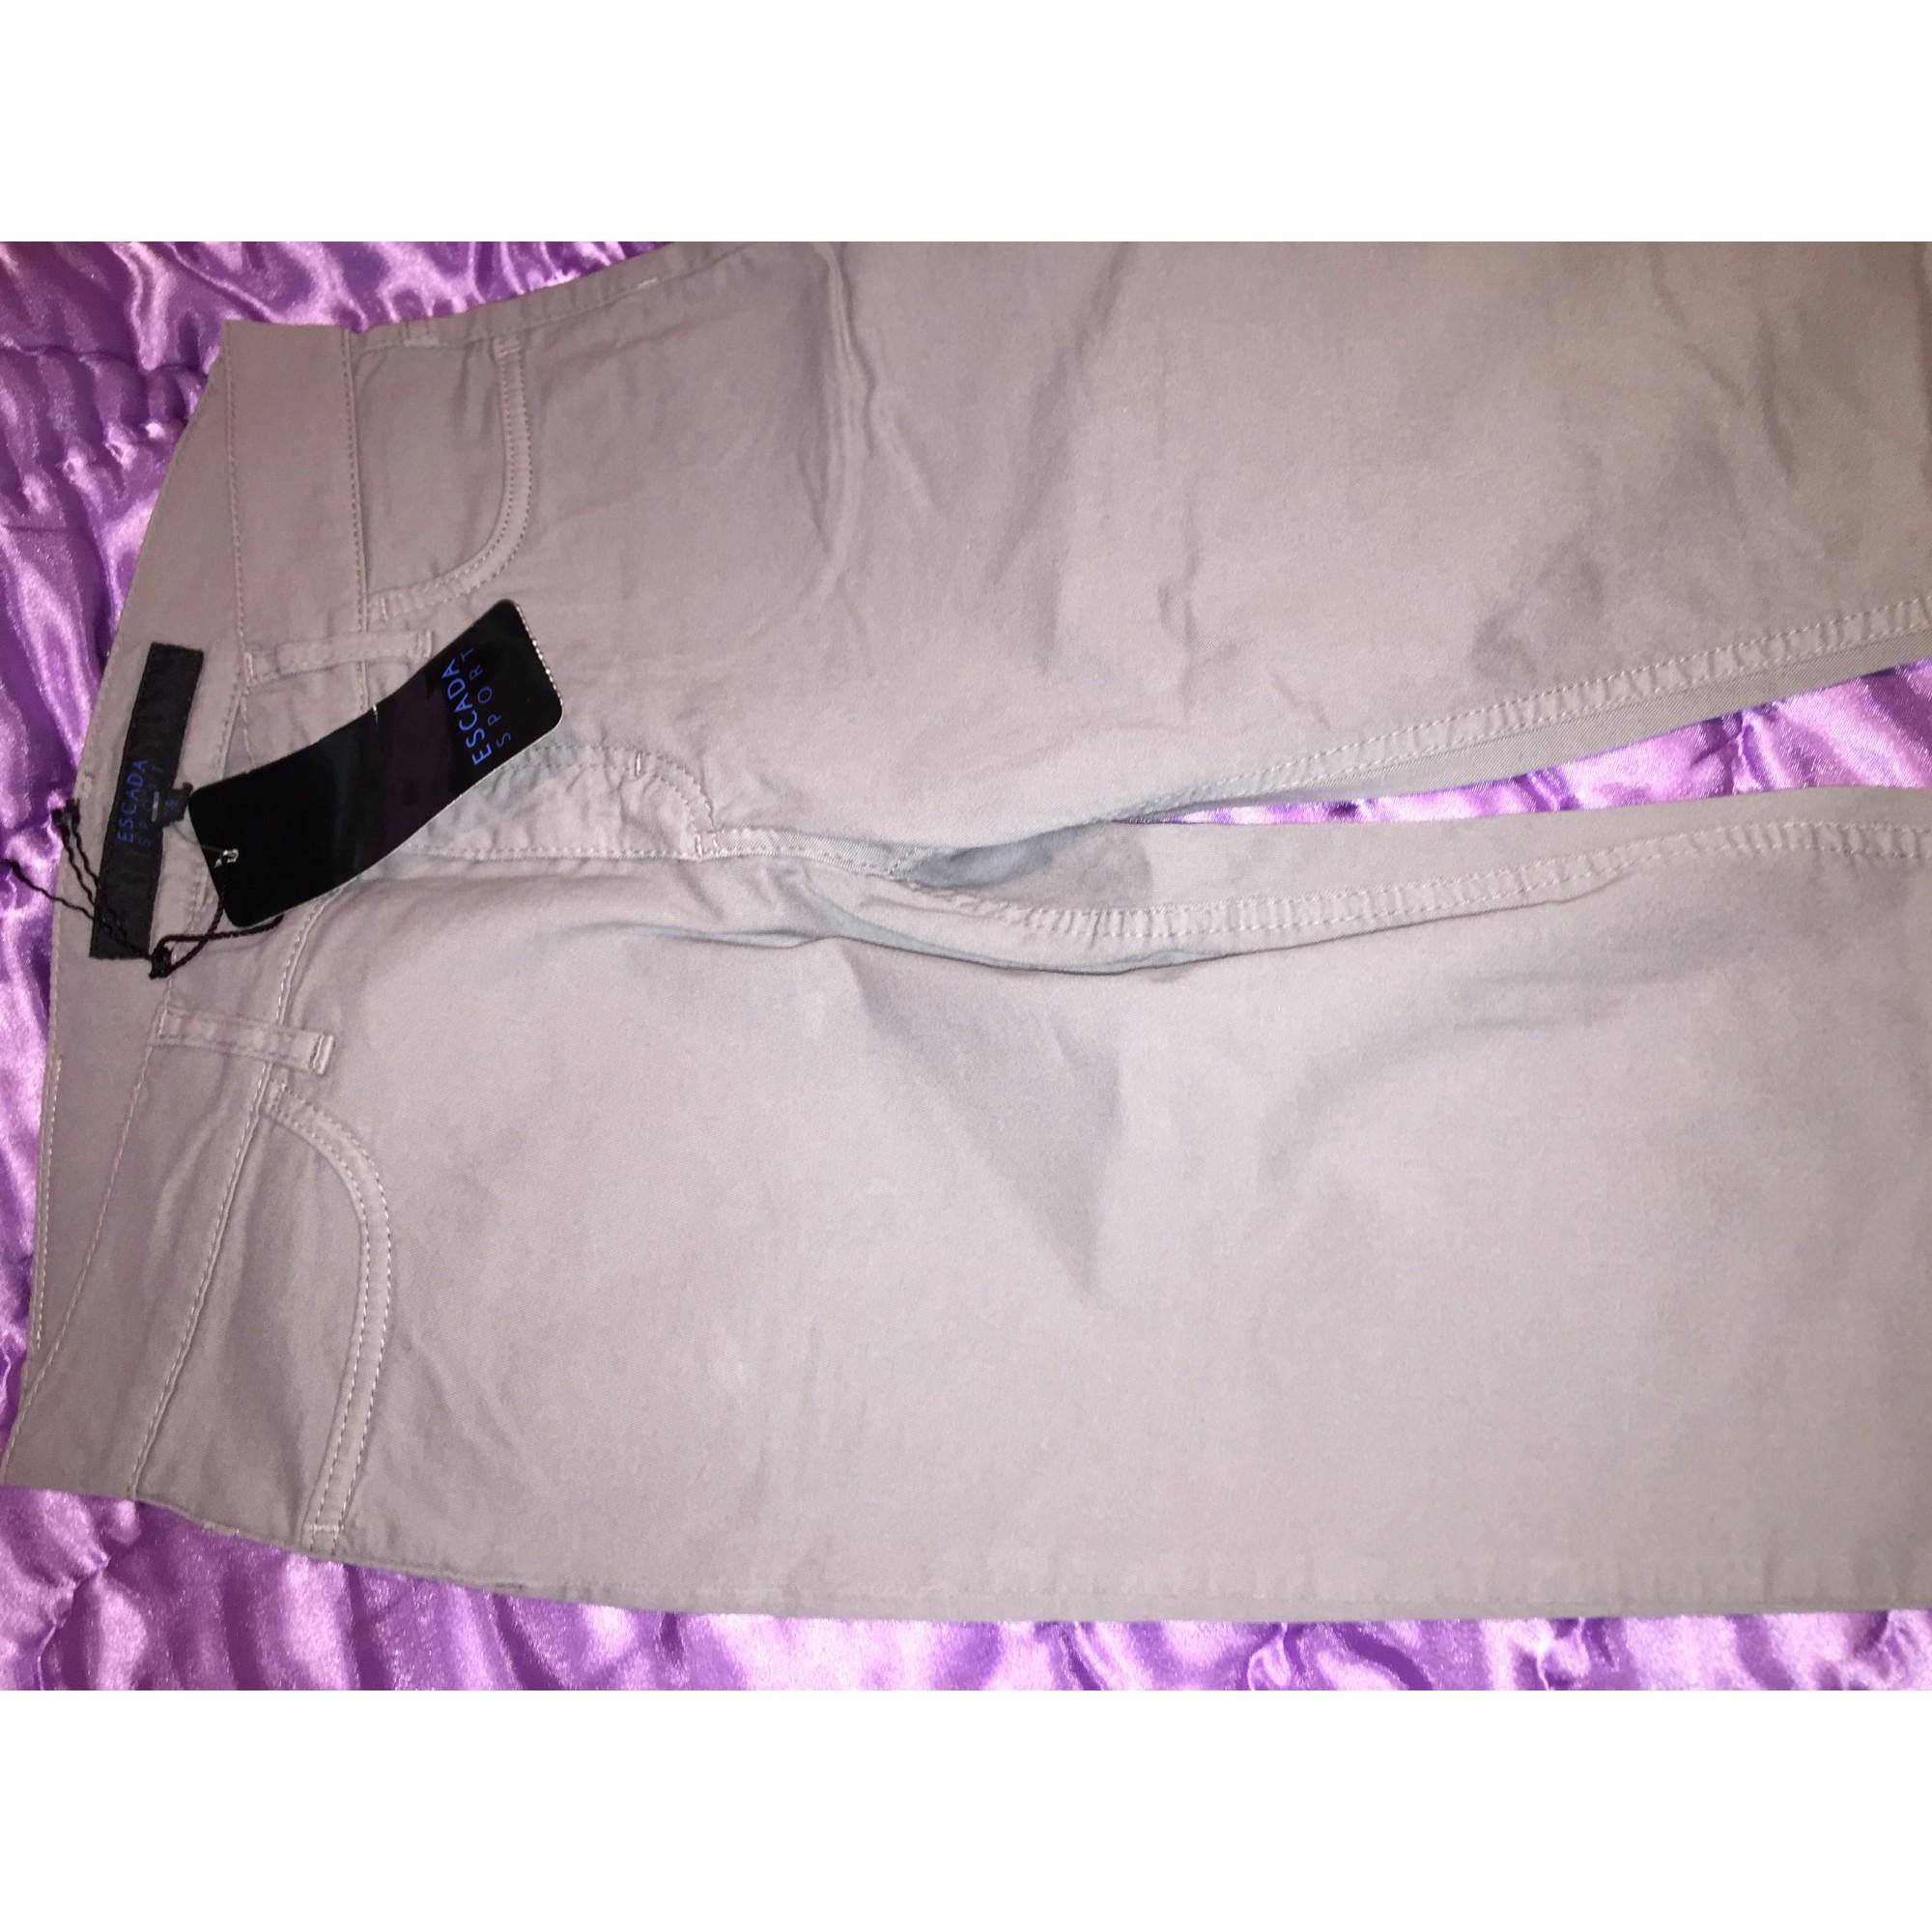 Pantalon droit ESCADA Gris, anthracite